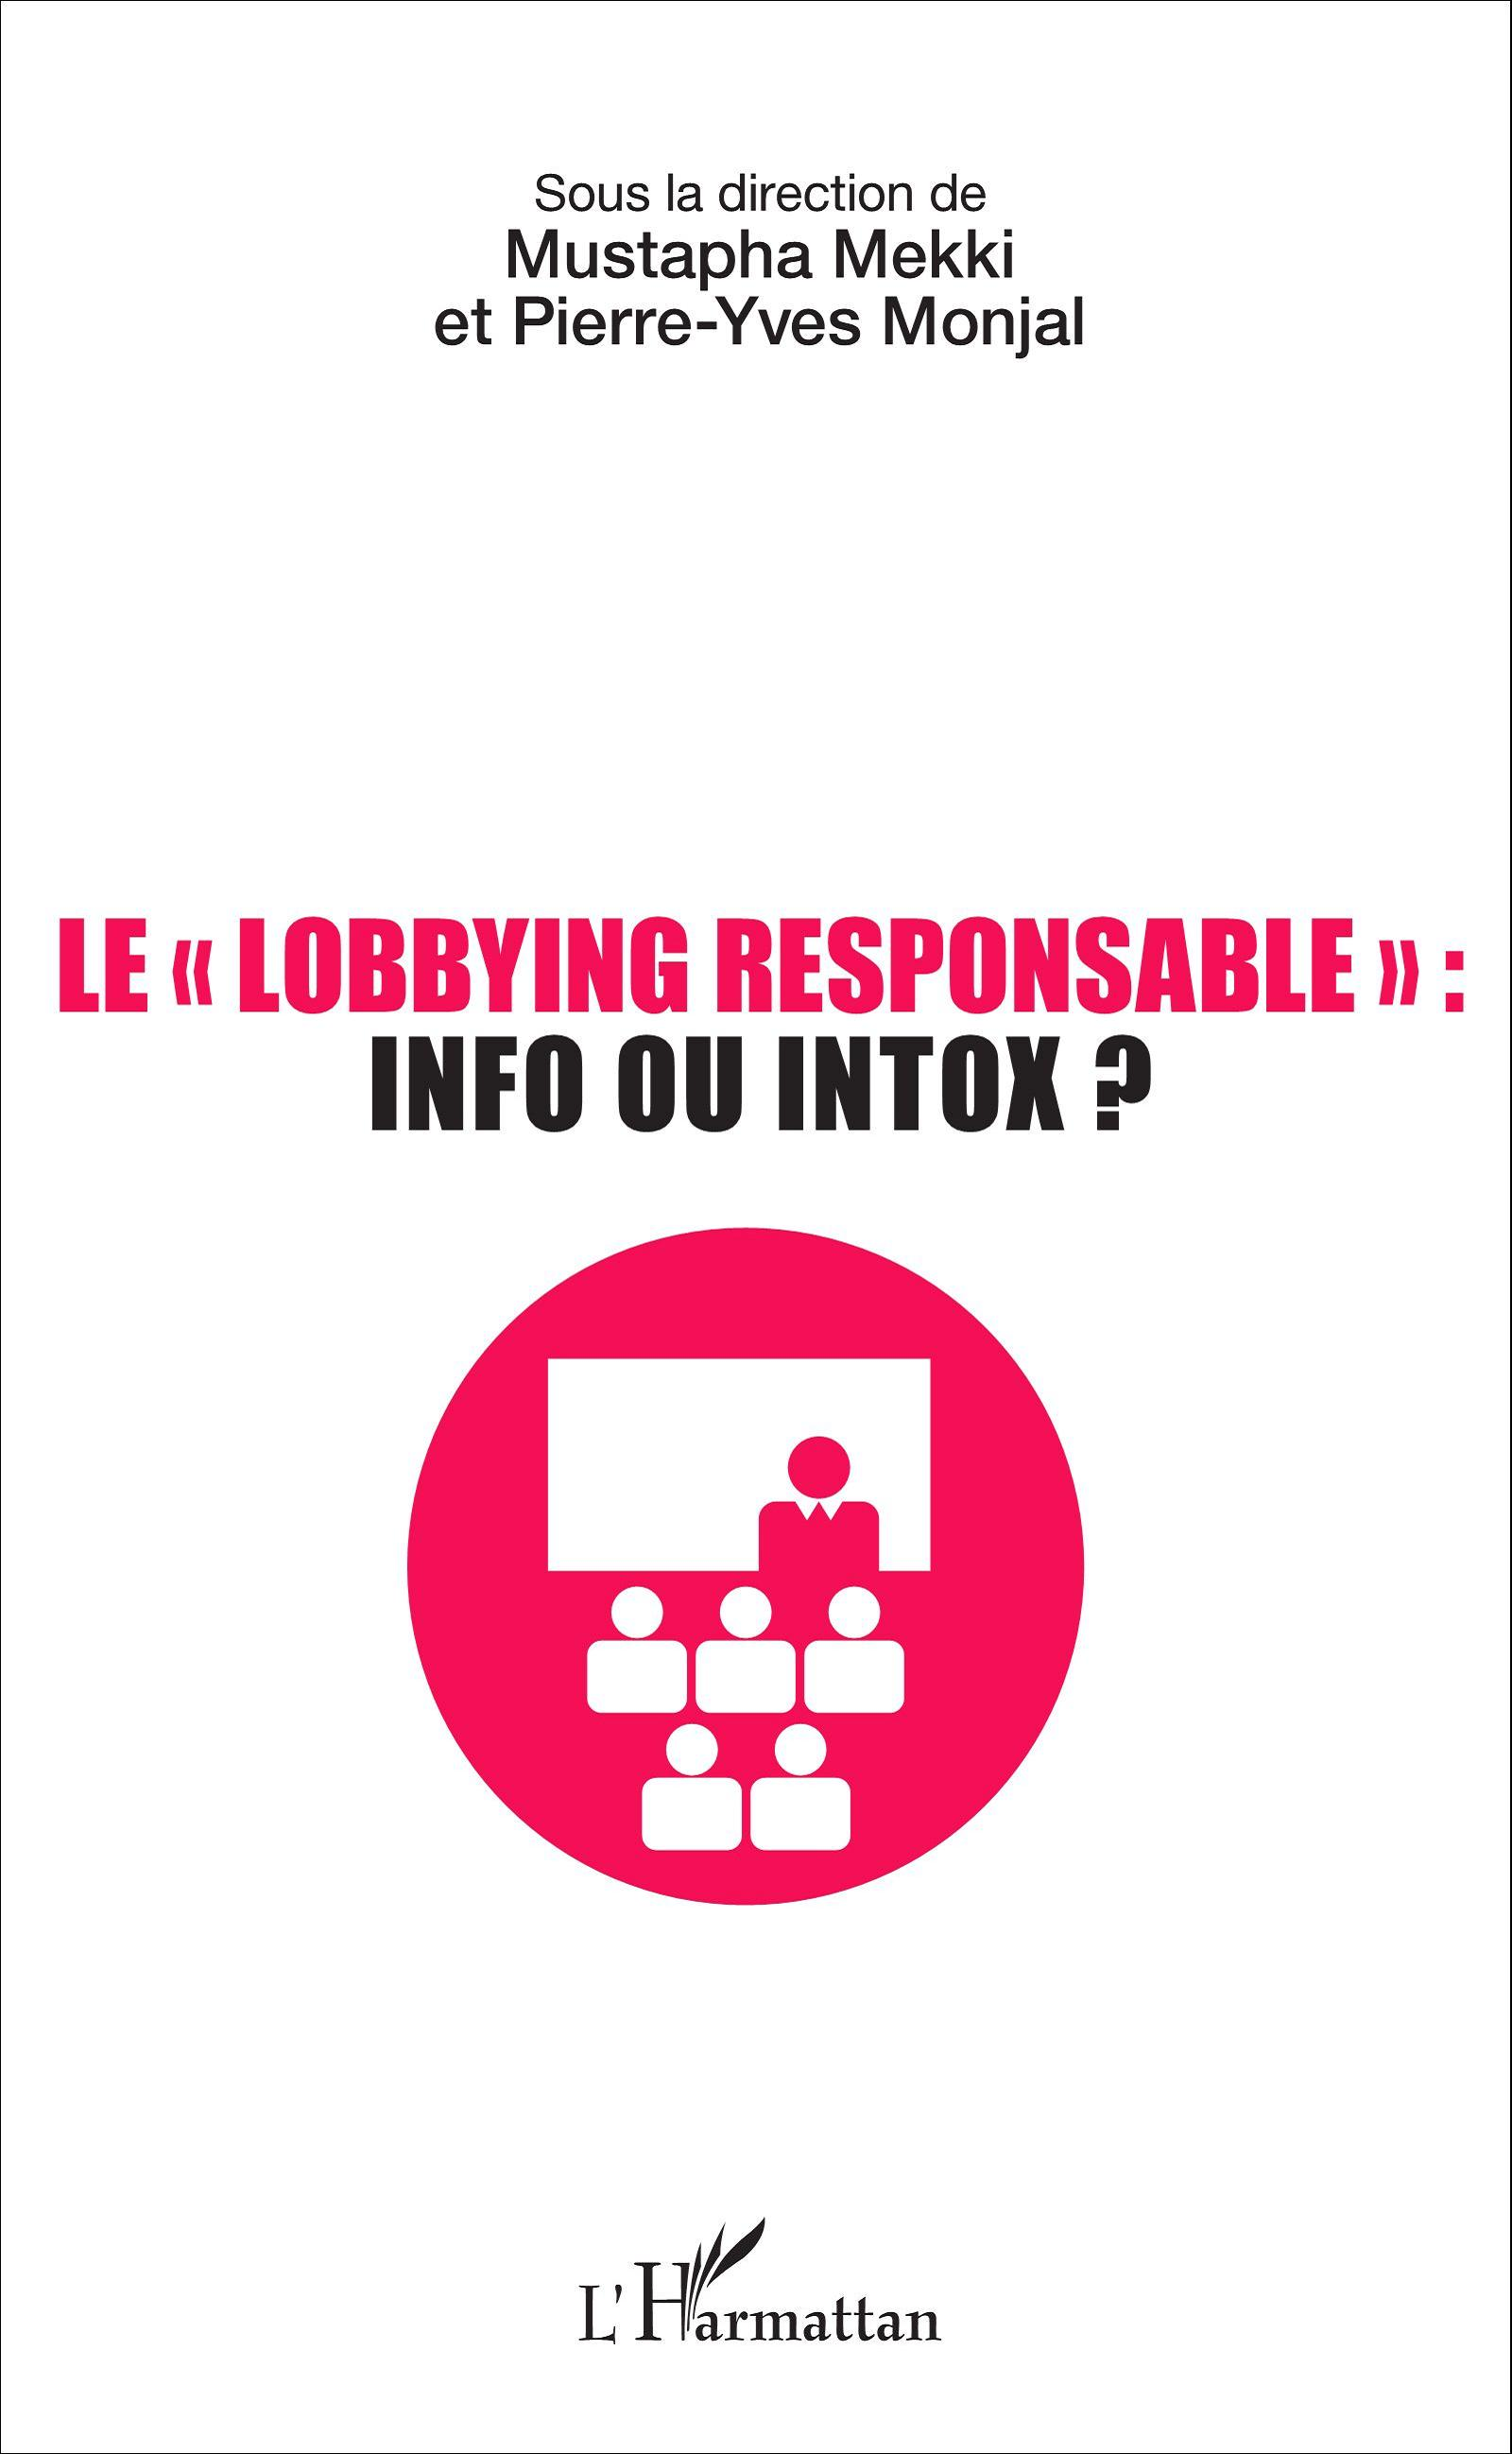 Le lobbying responsable info ou intox sous la direction de mustapha mek - Loyer fictif info ou intox ...